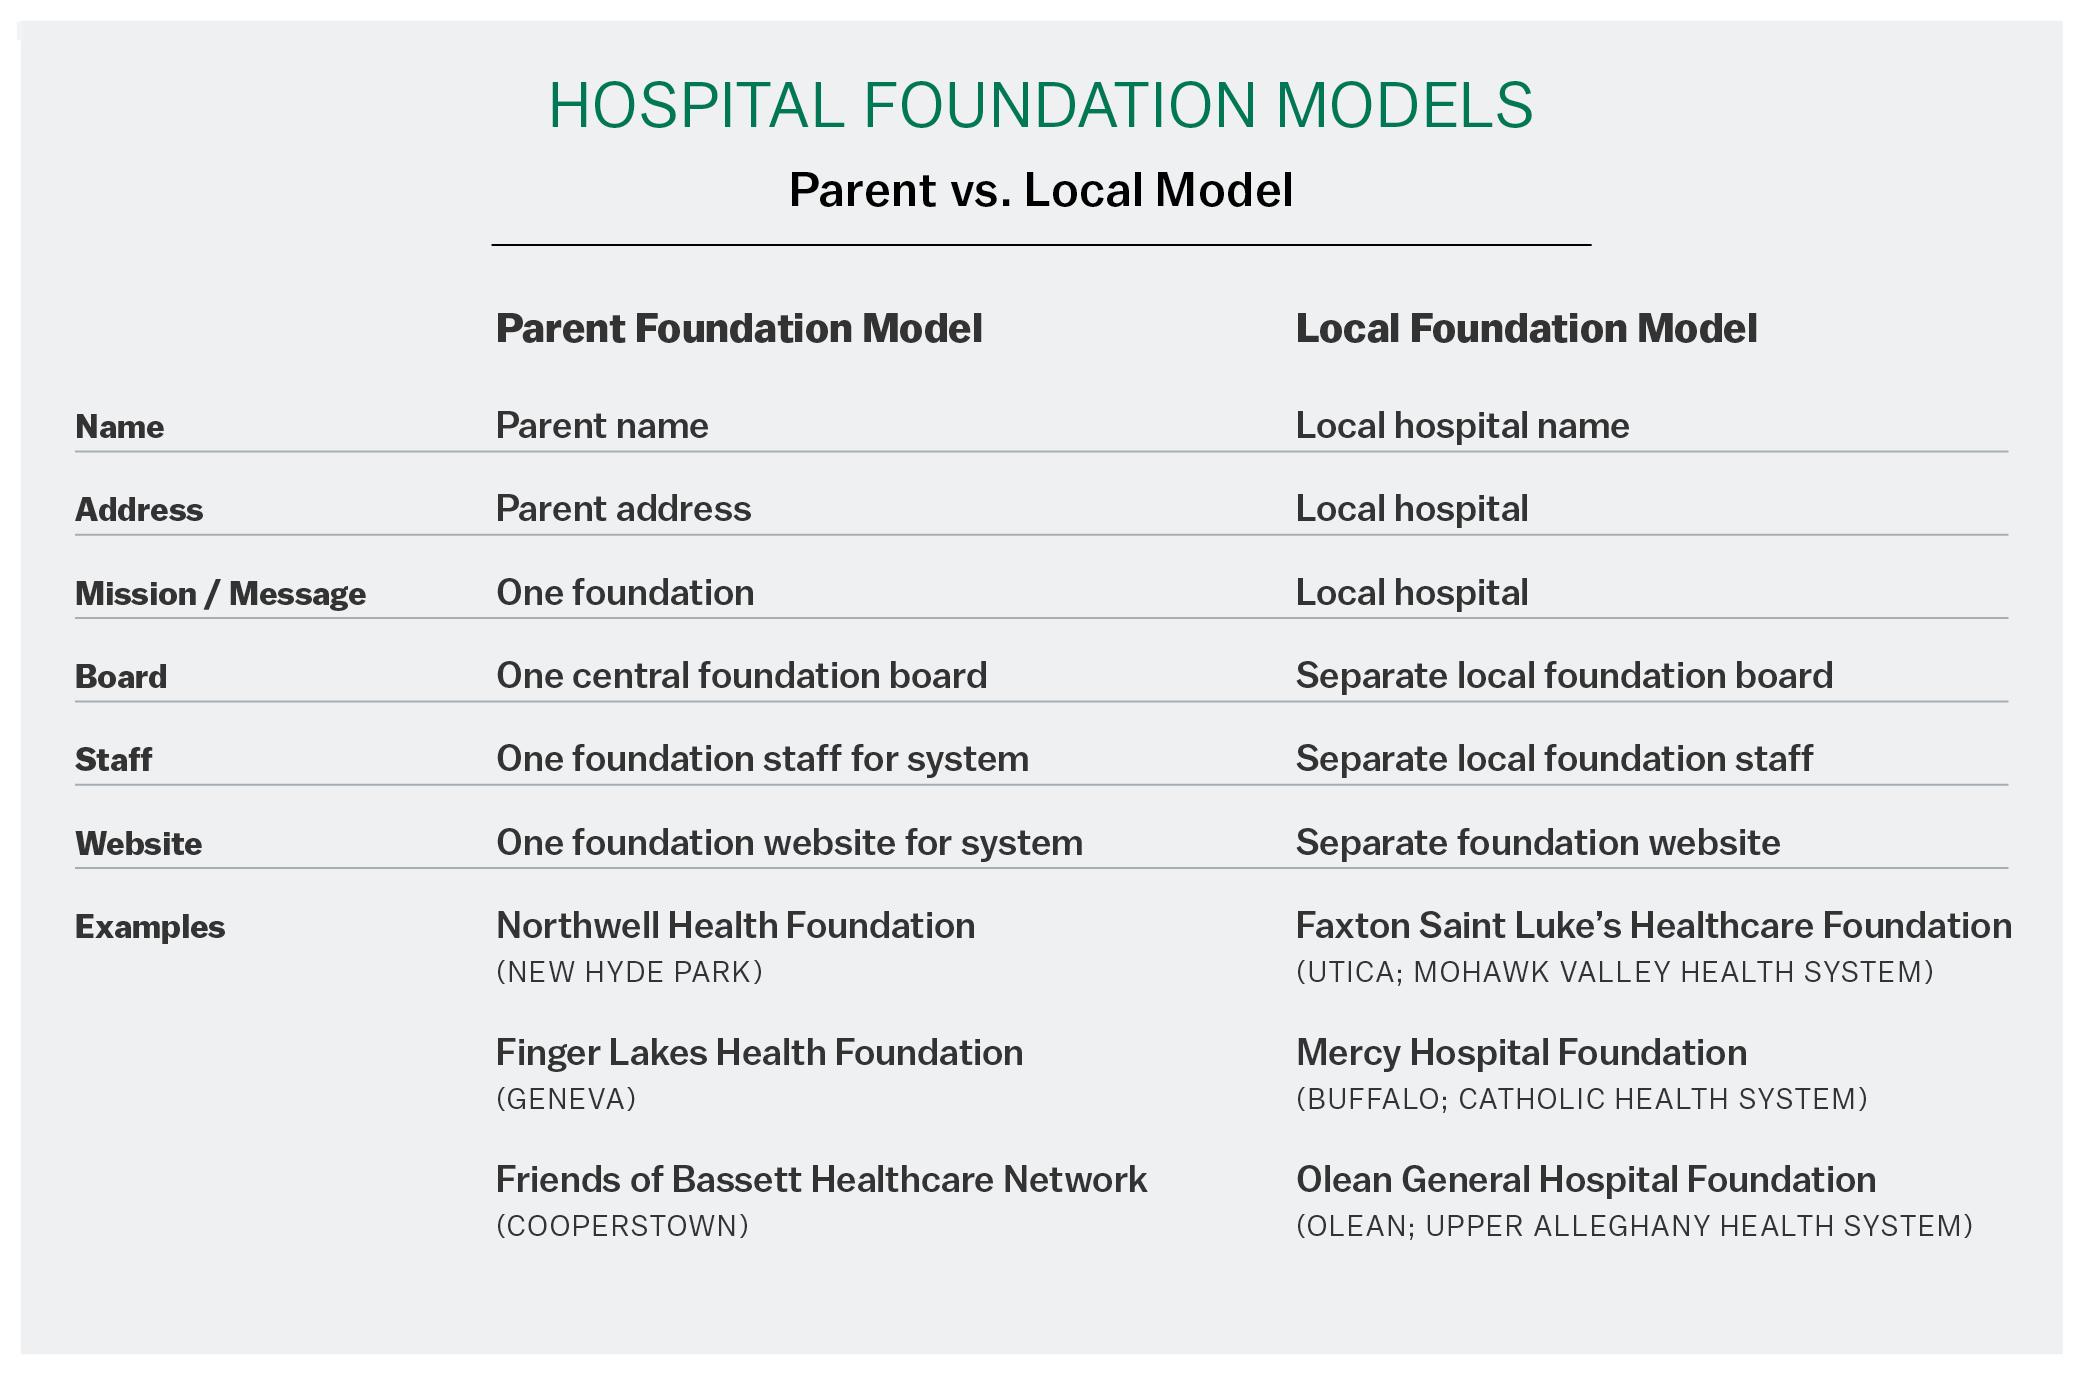 Hospital Foundation Models Parent vs. Local Model